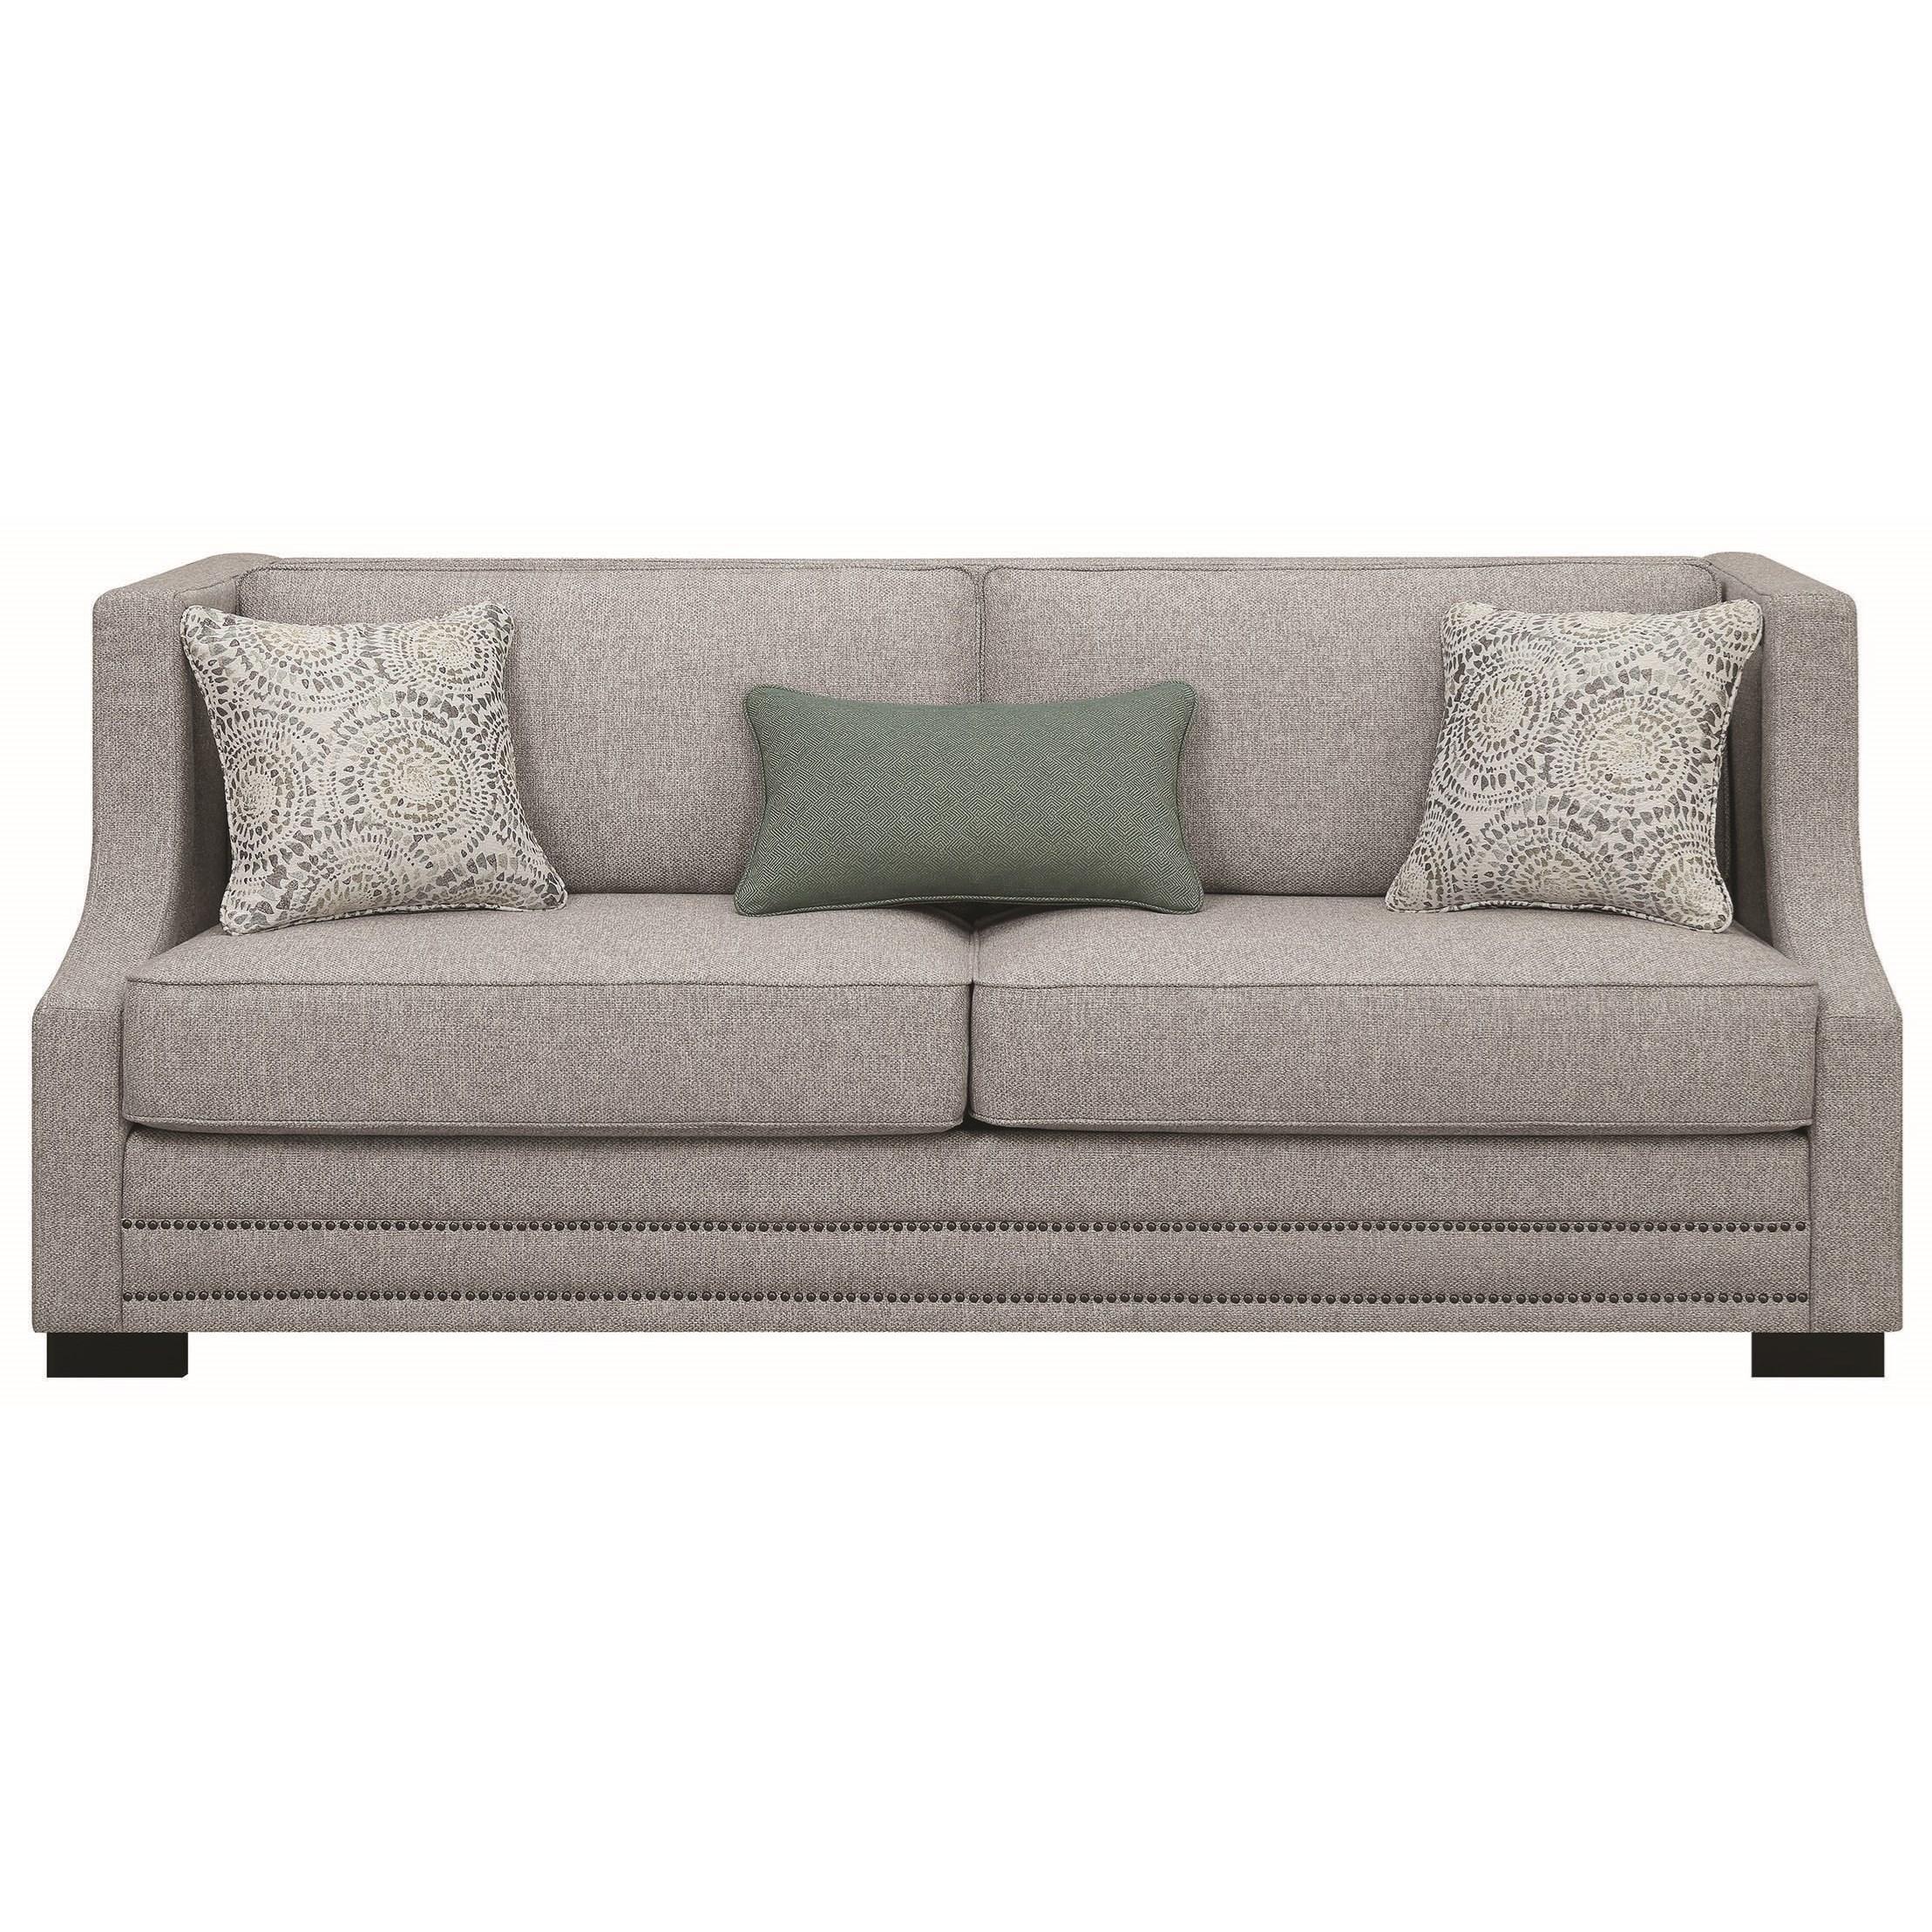 incredible Donny Osmond Sofa Part - 8: Donny Osmond Home SullivanSofa ...